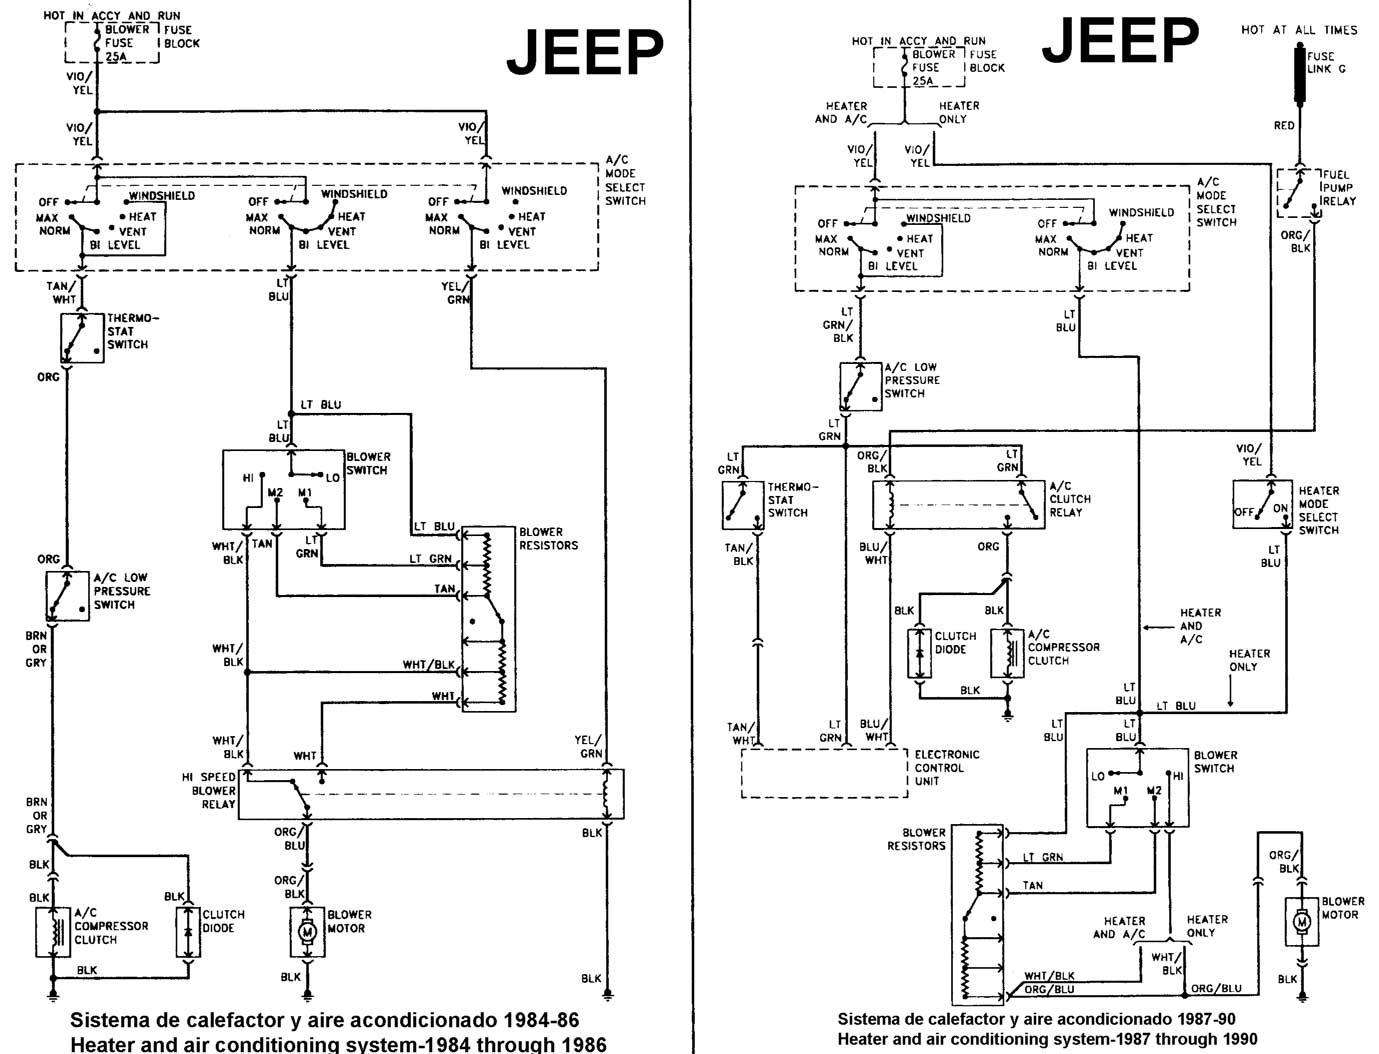 Wiring Diagram Jeep Liberty Sport Jeep Auto Wiring